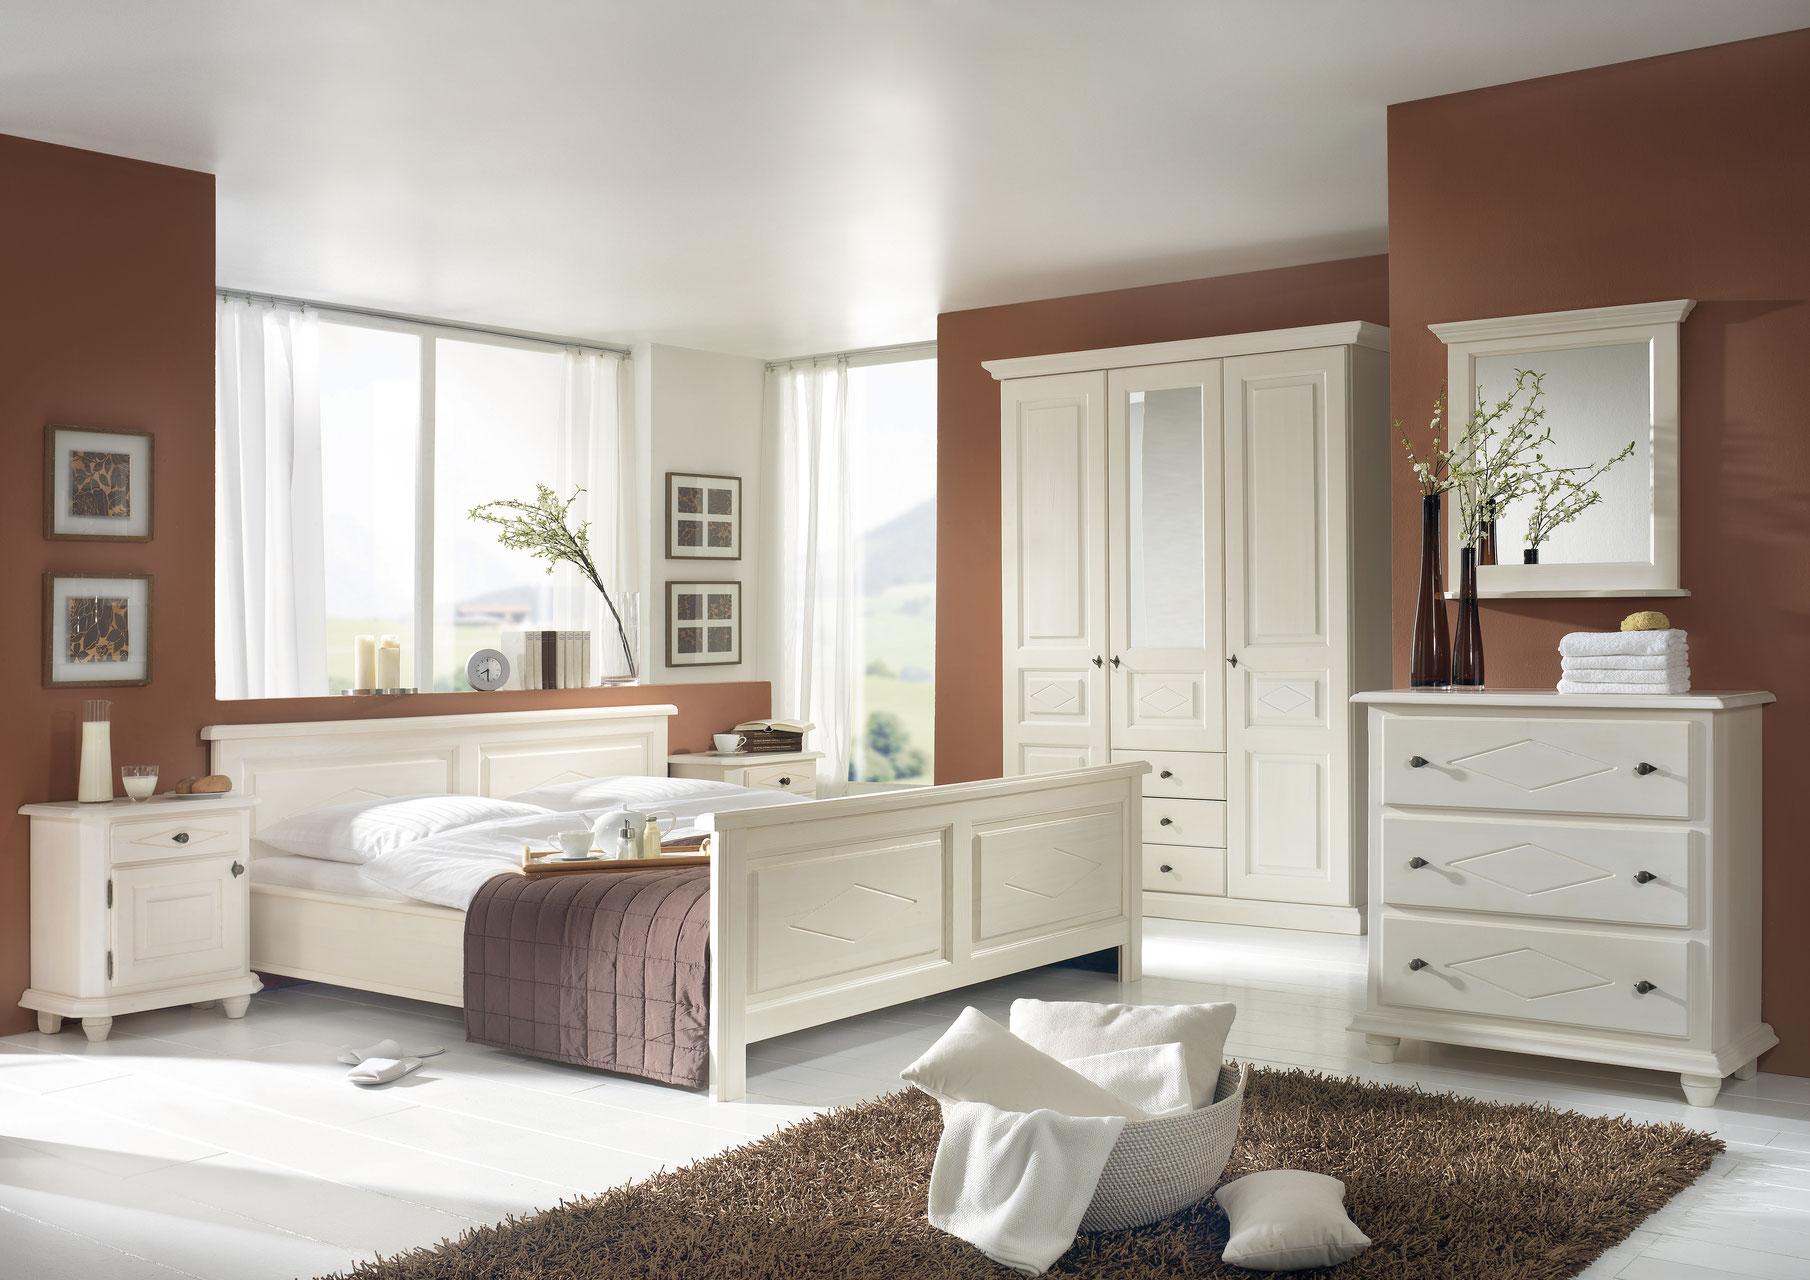 landhaus Schlafzimmer - Naturnah Möbel - Moderne Massivholzmöbel